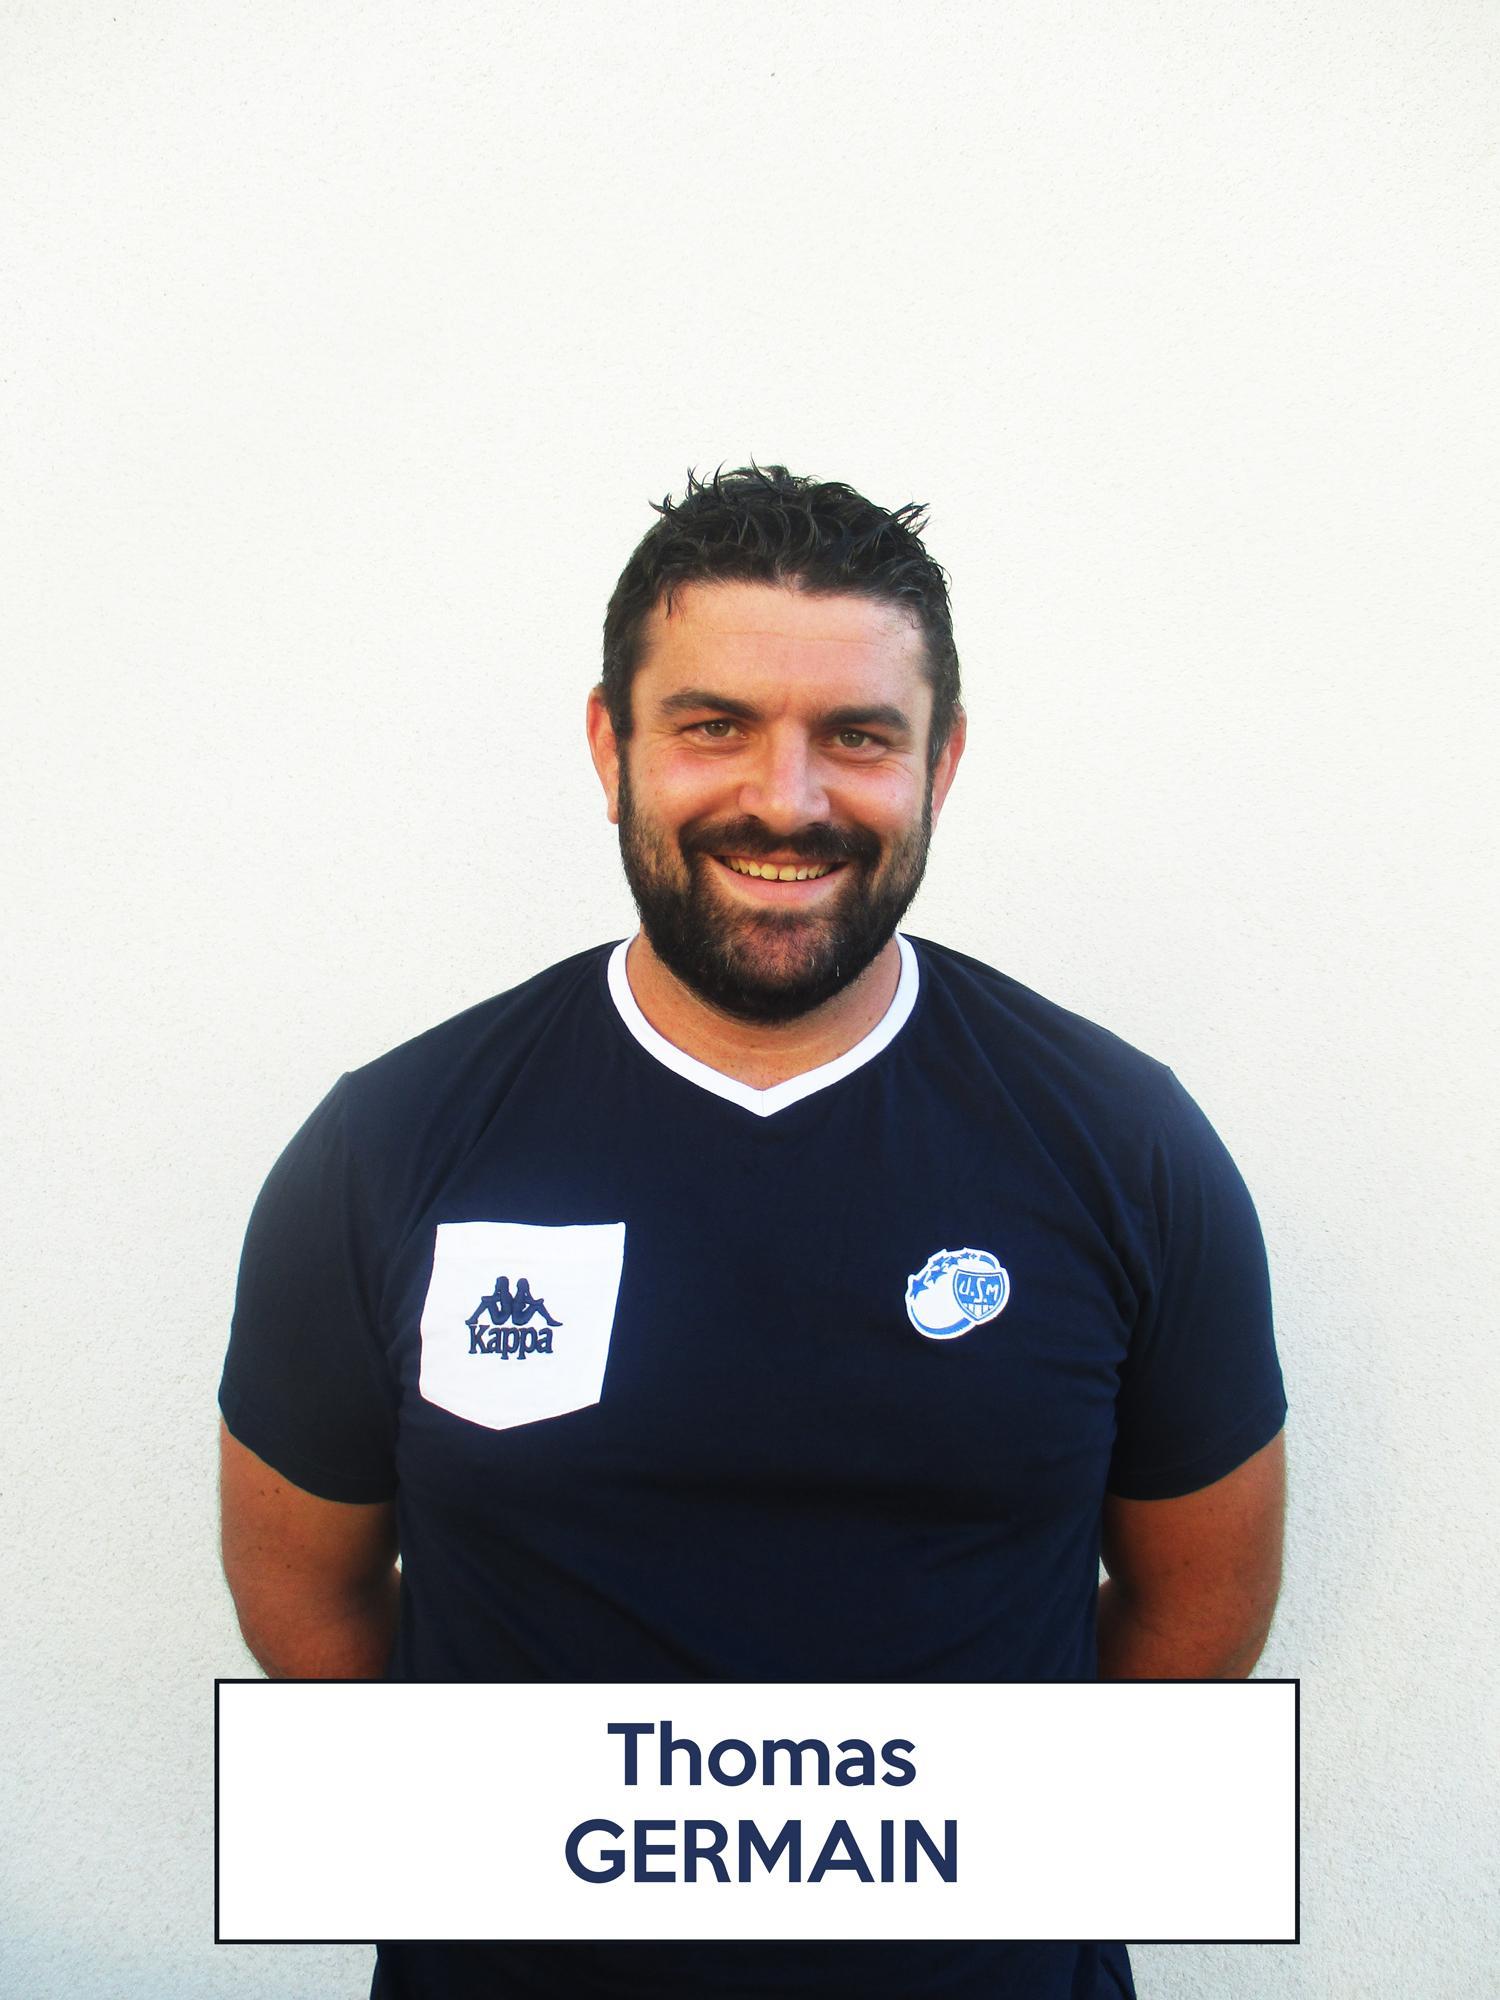 Thomas Germain